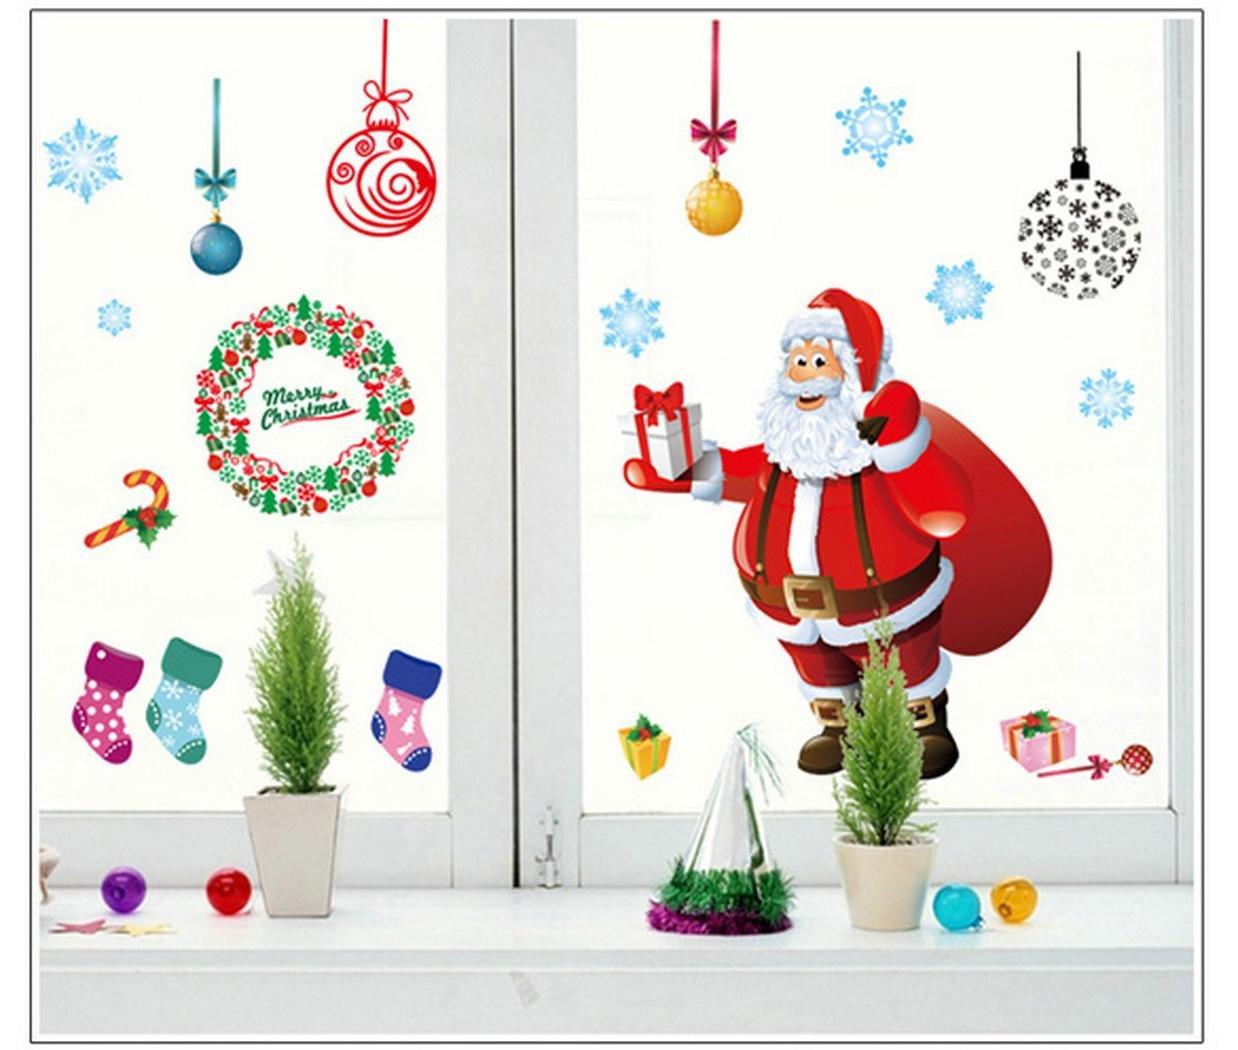 FINEJO New Christmas Wall Sticker DIY Santa Claus Xmas ...